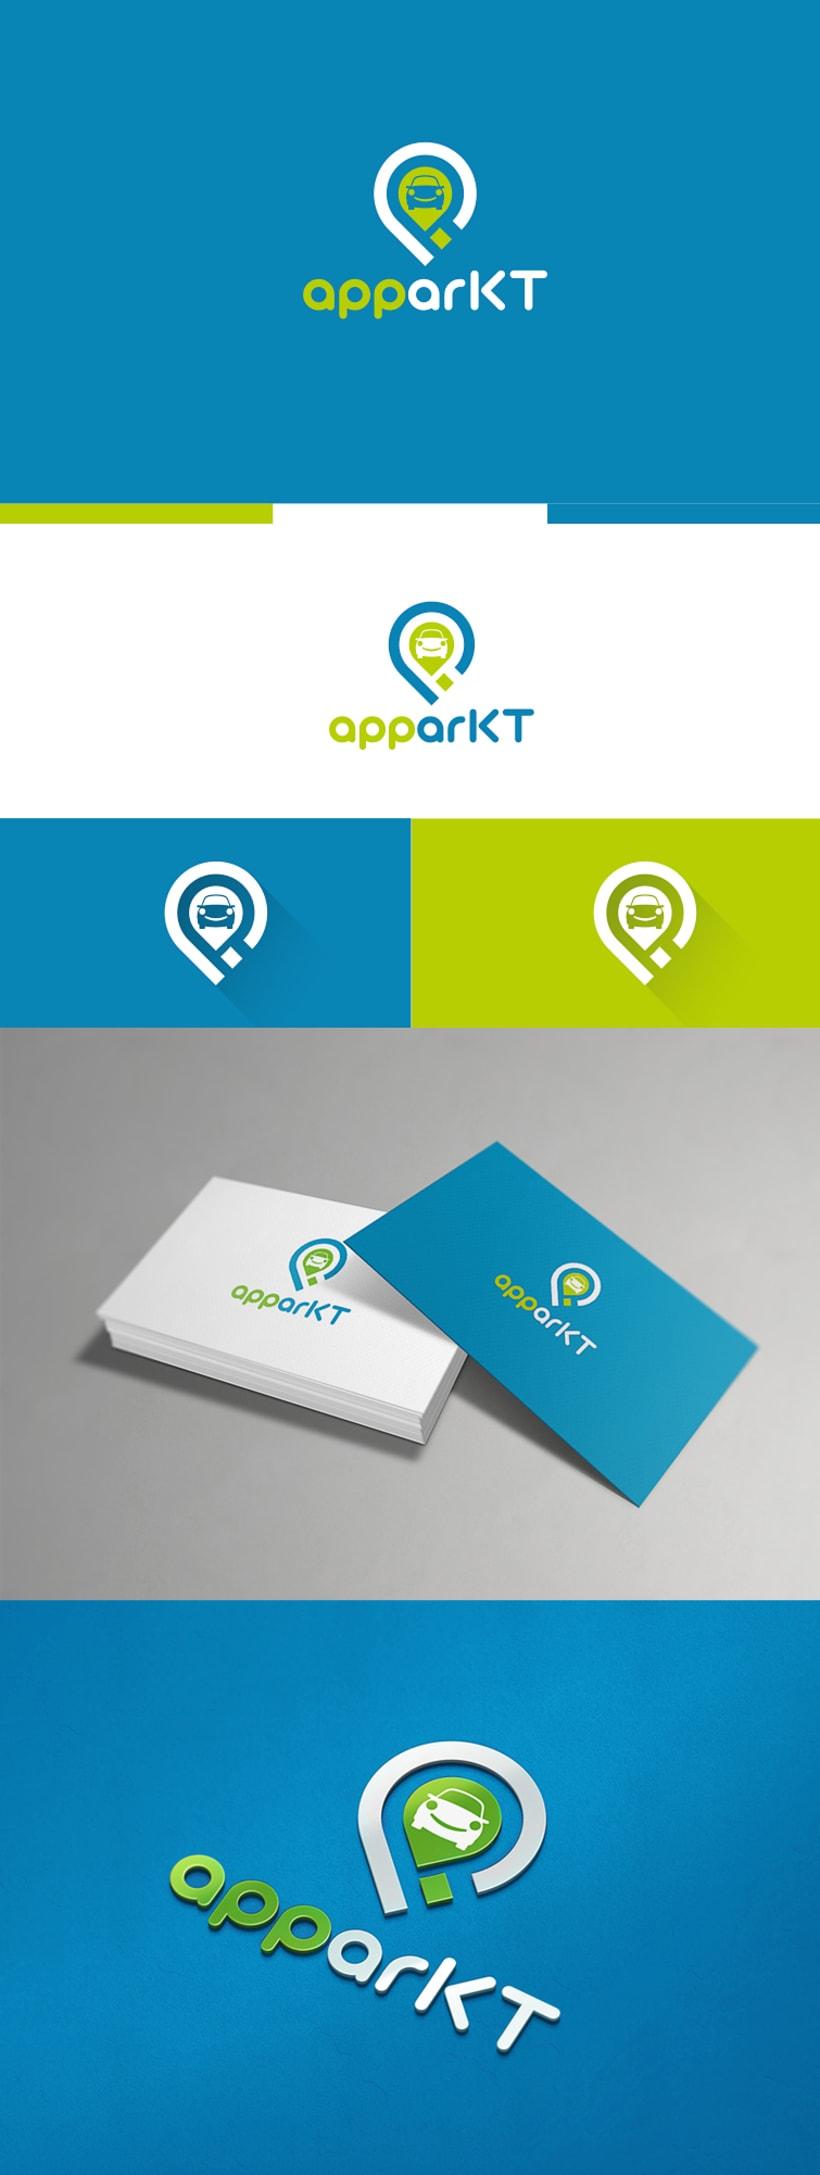 "apparKT ""un clic, un lugar"" -1"